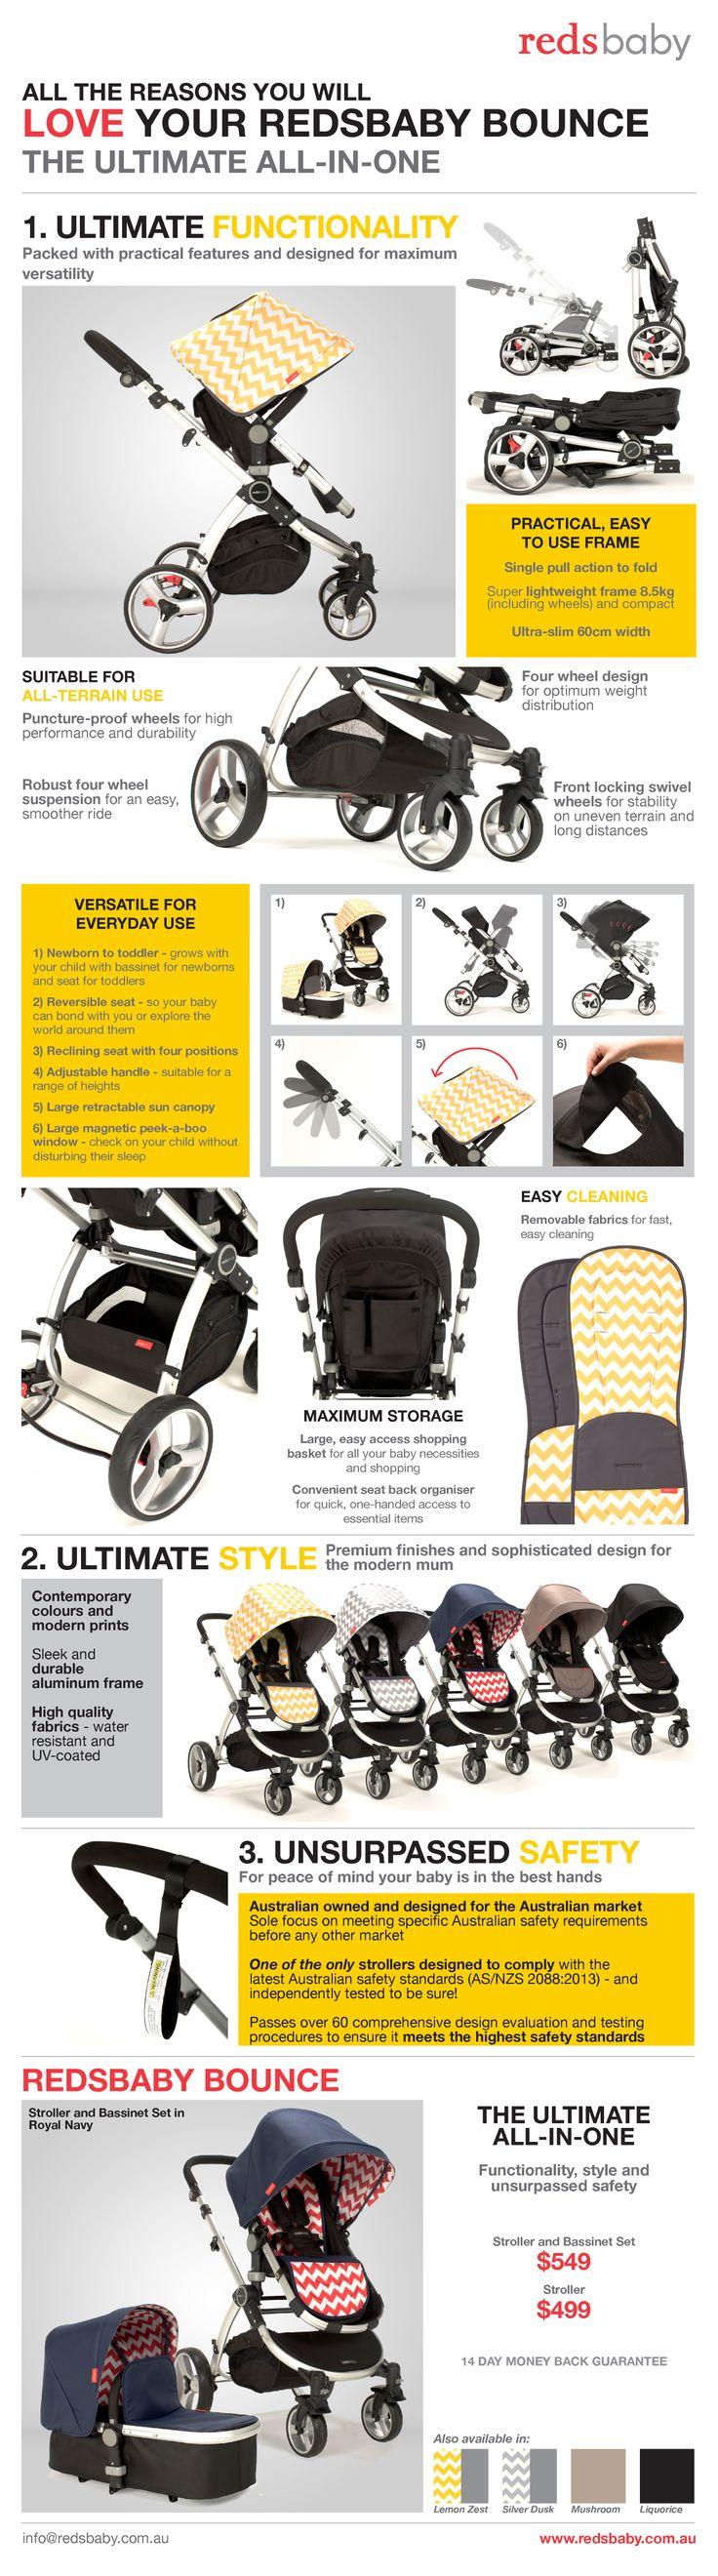 Redsbaby Bounce - The Ultimate All-In-One Stroller/ Pram www.redsbaby.com.au